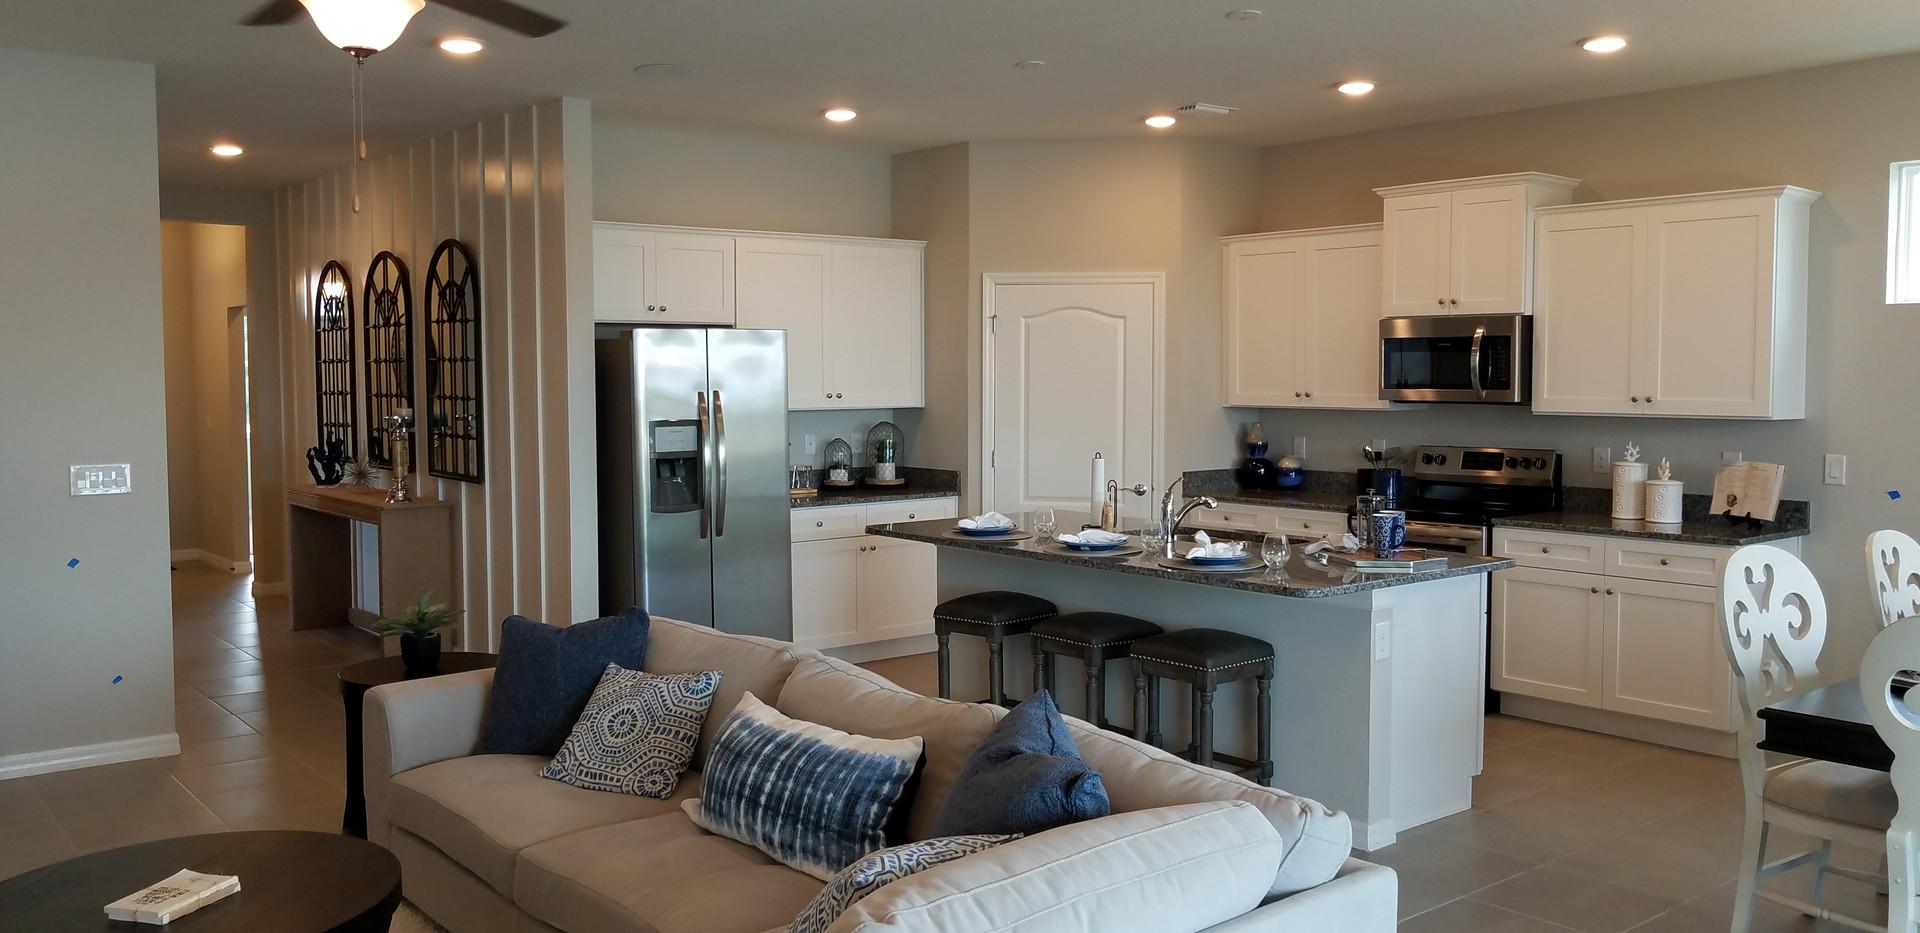 The Palisades Lakewood Ranch model home kitchen